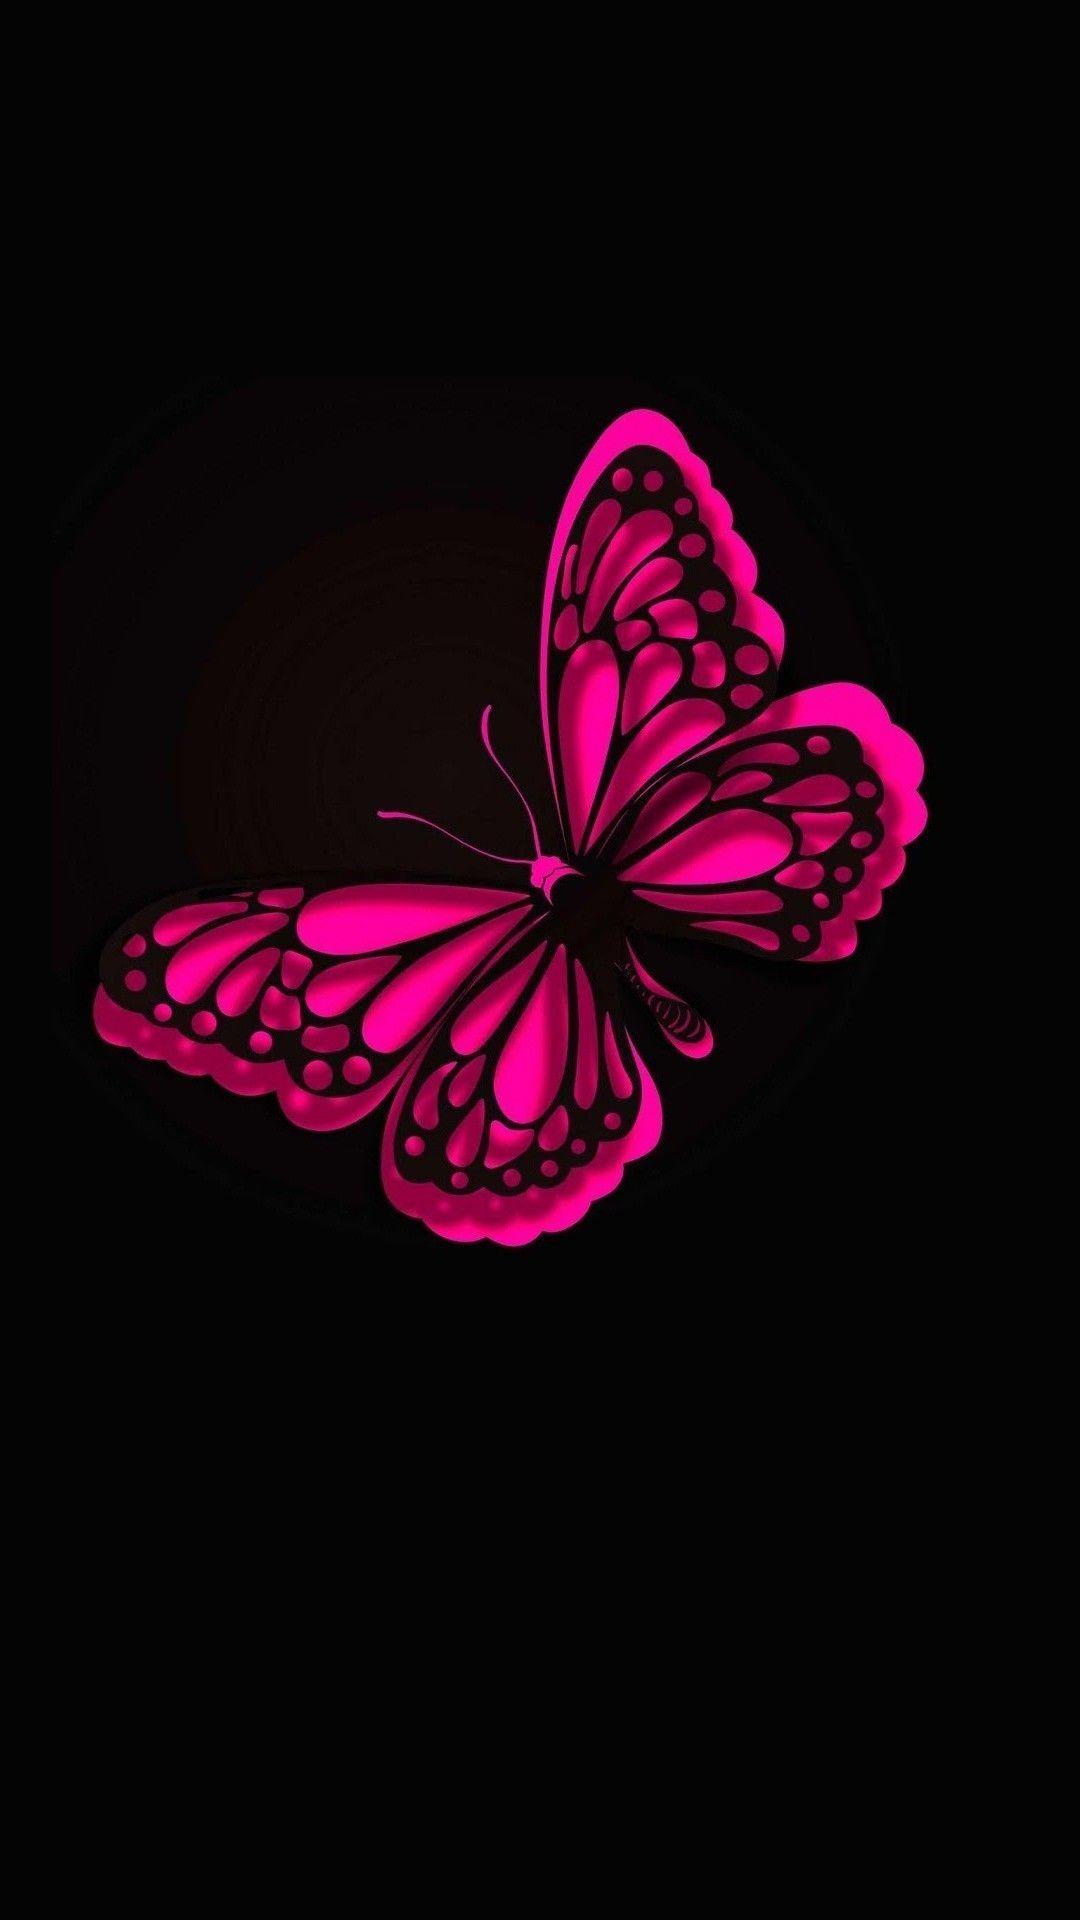 Neon Butterfly Hd Wallpapers Top Free Neon Butterfly Hd Backgrounds Wallpaperaccess